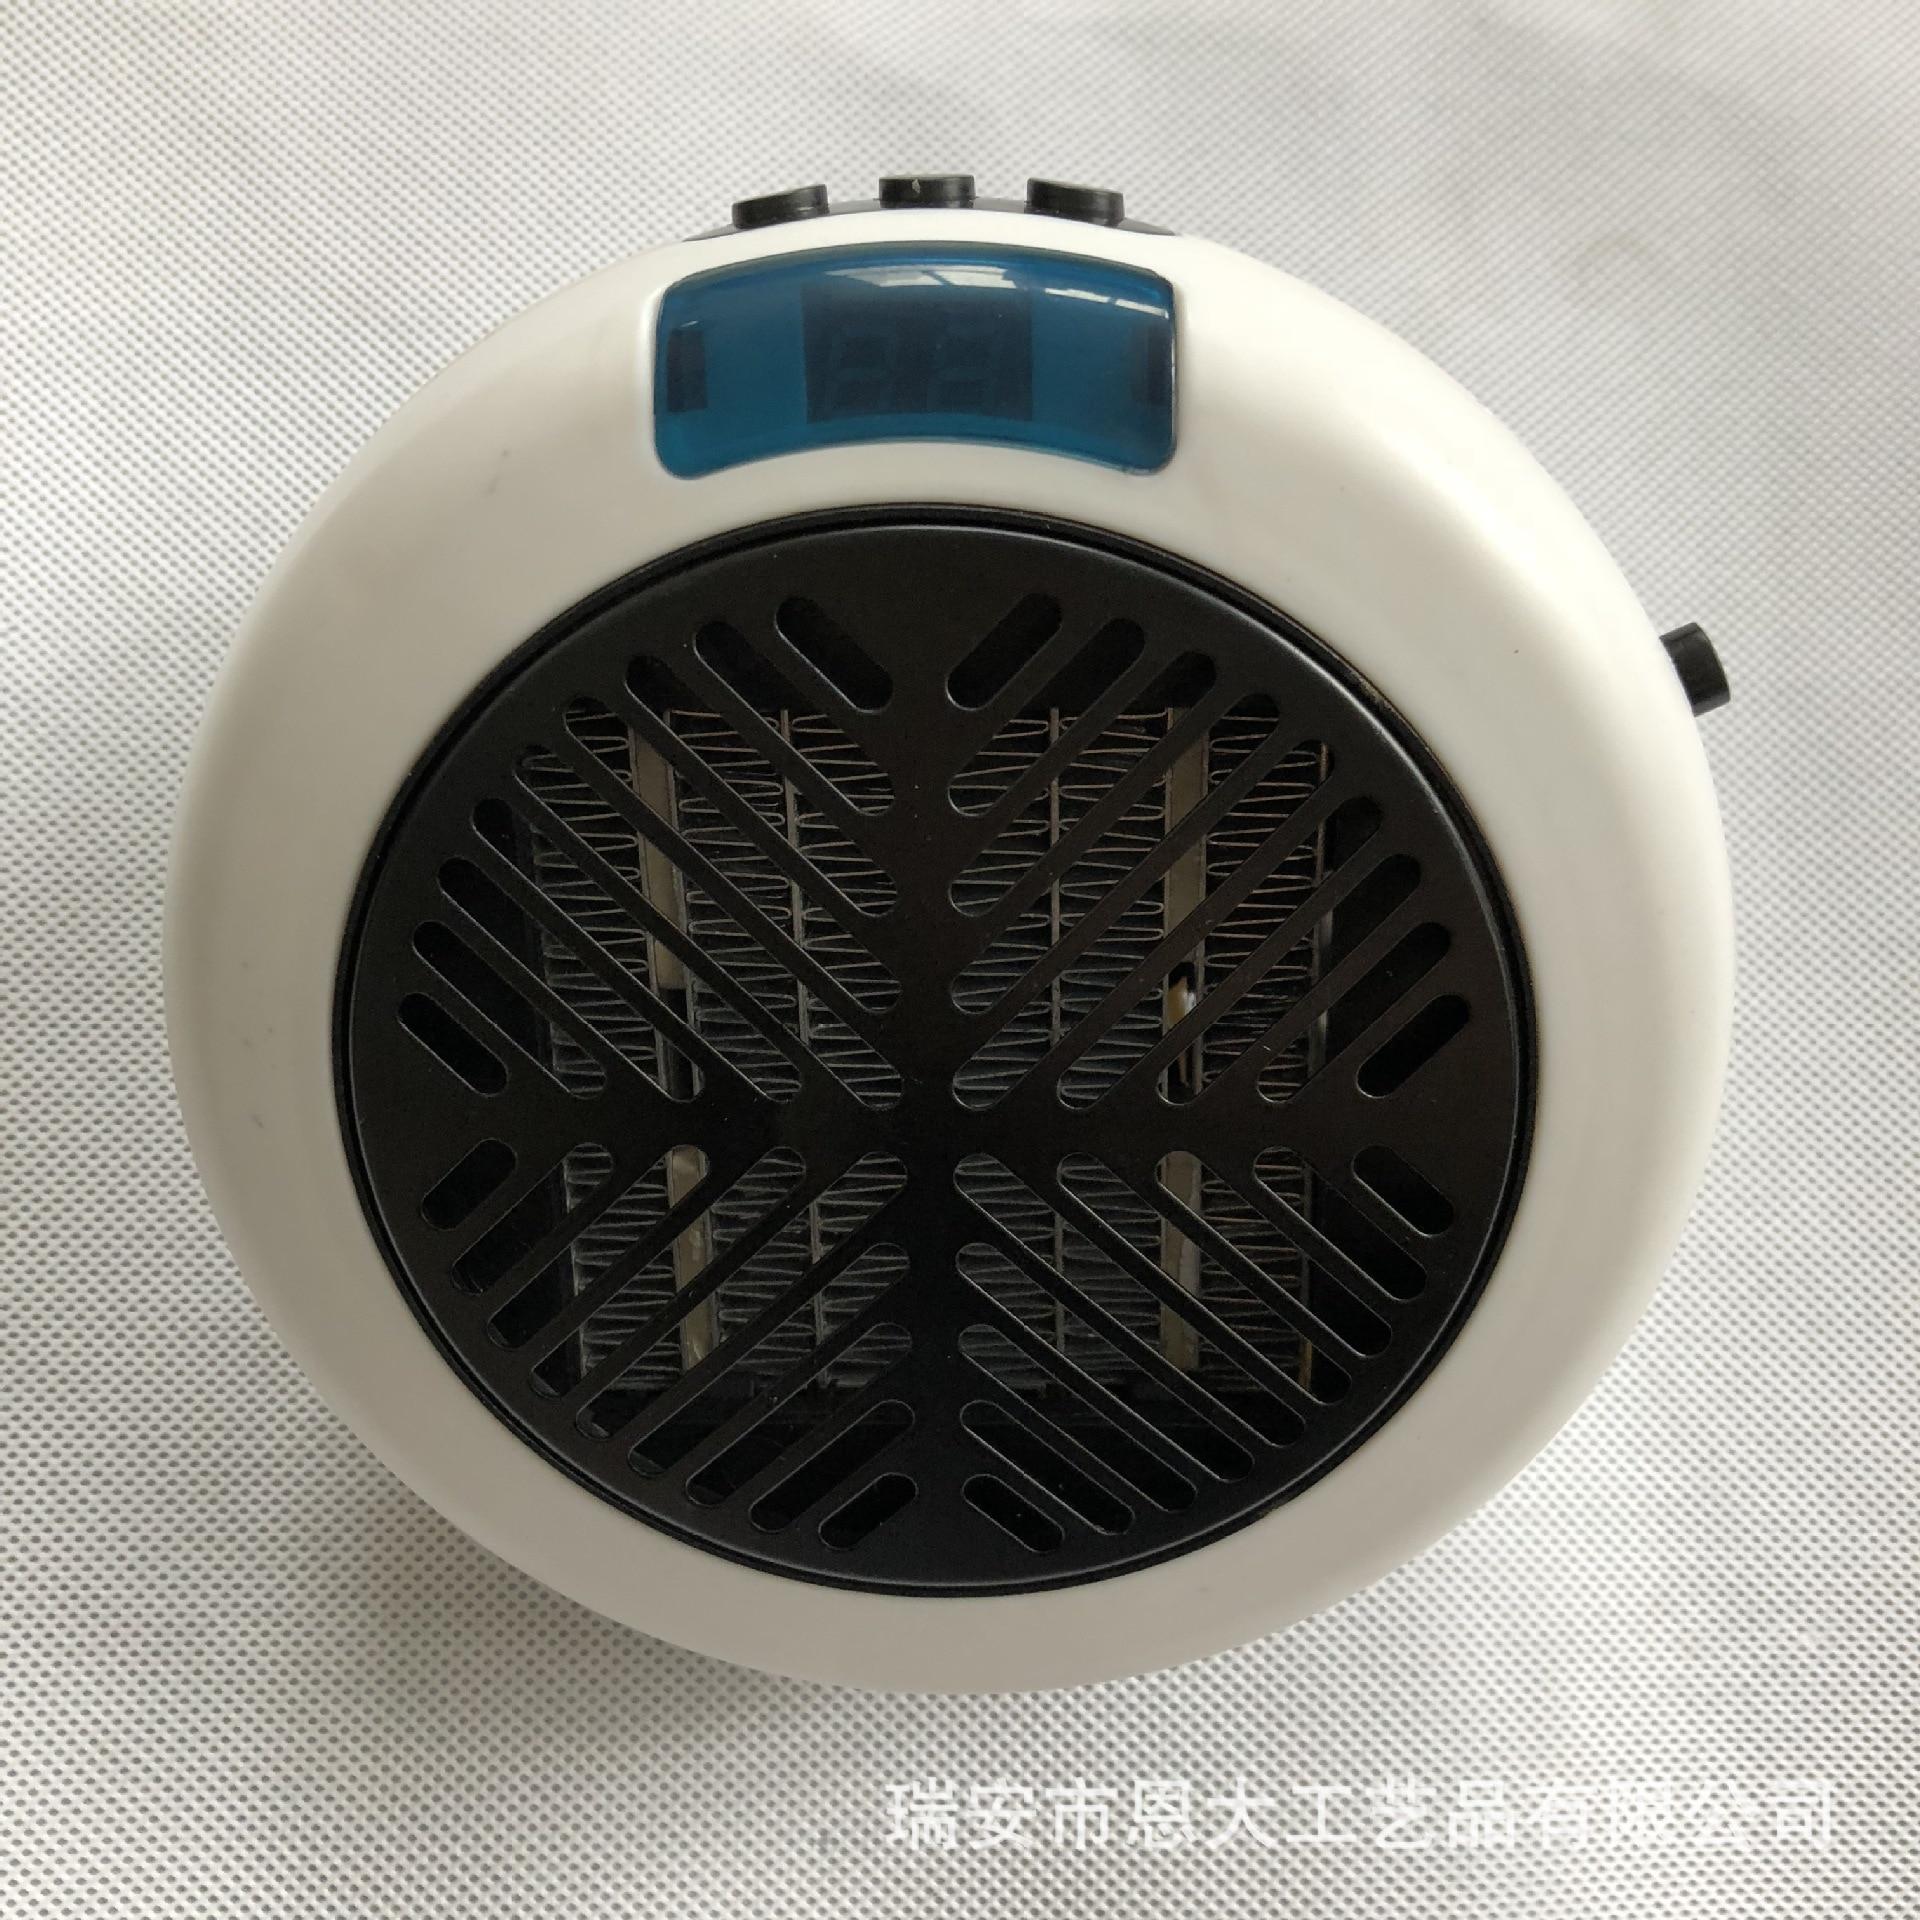 Radiateur transfrontalier rond 900 W nouveau Style Mini bureau de chauffage